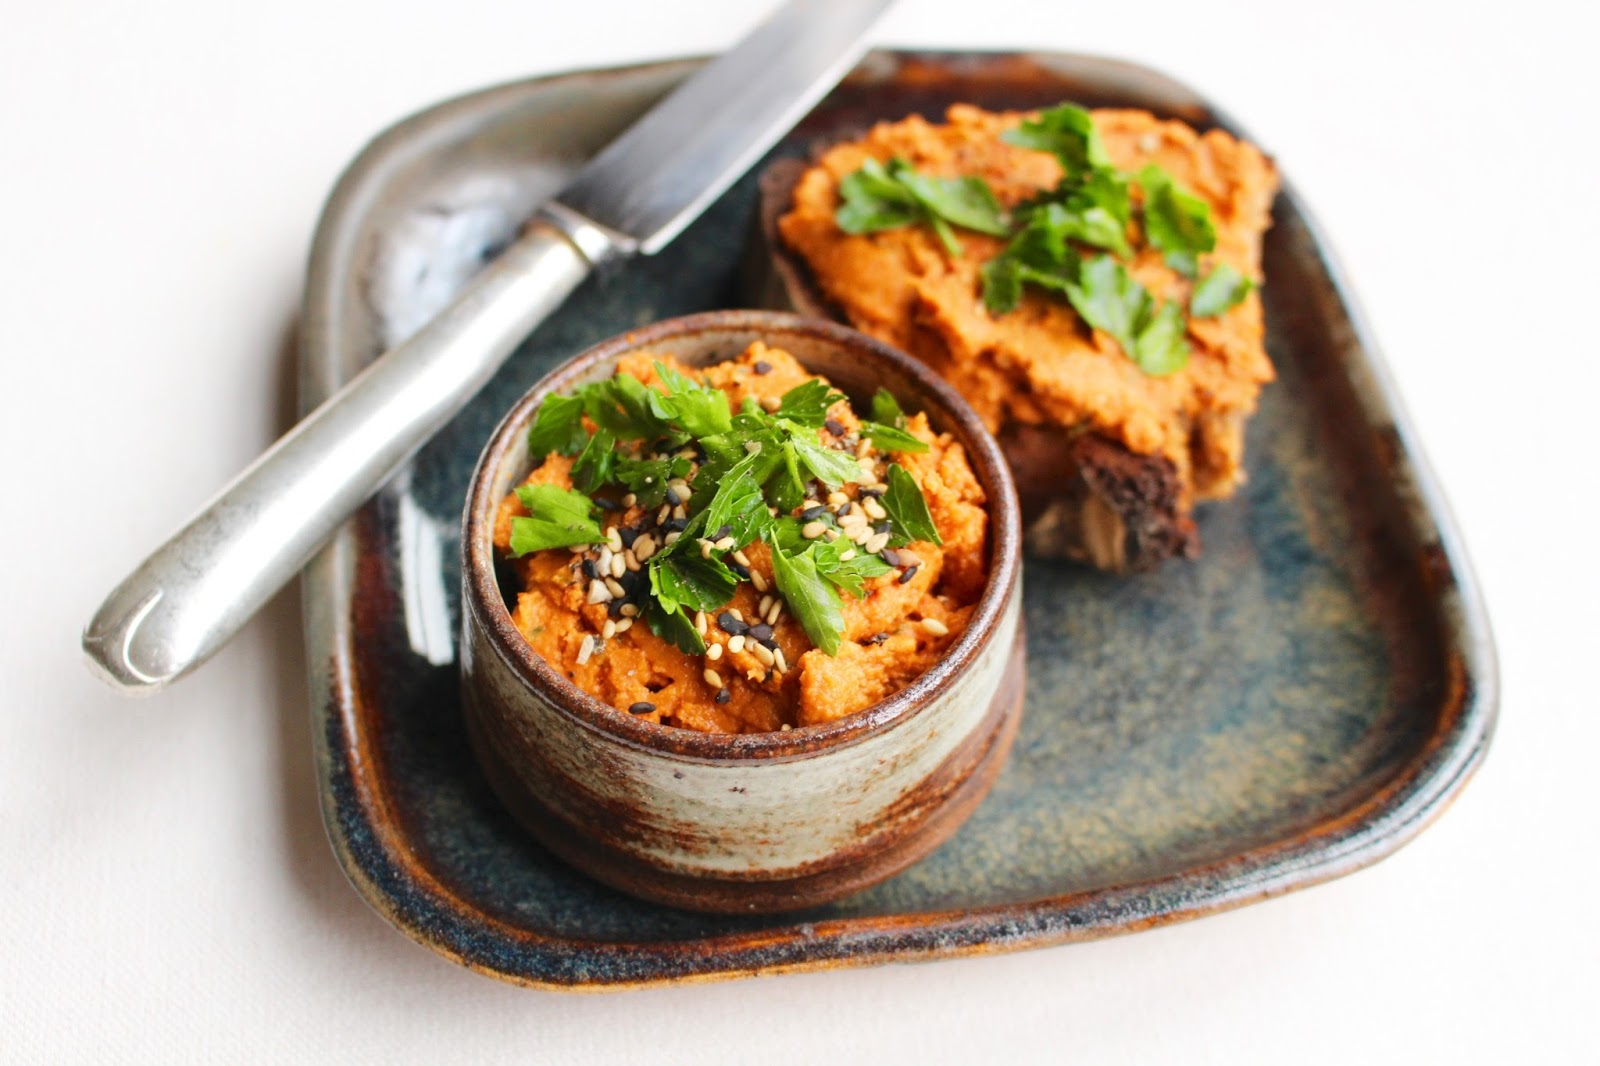 Red hummus recipe